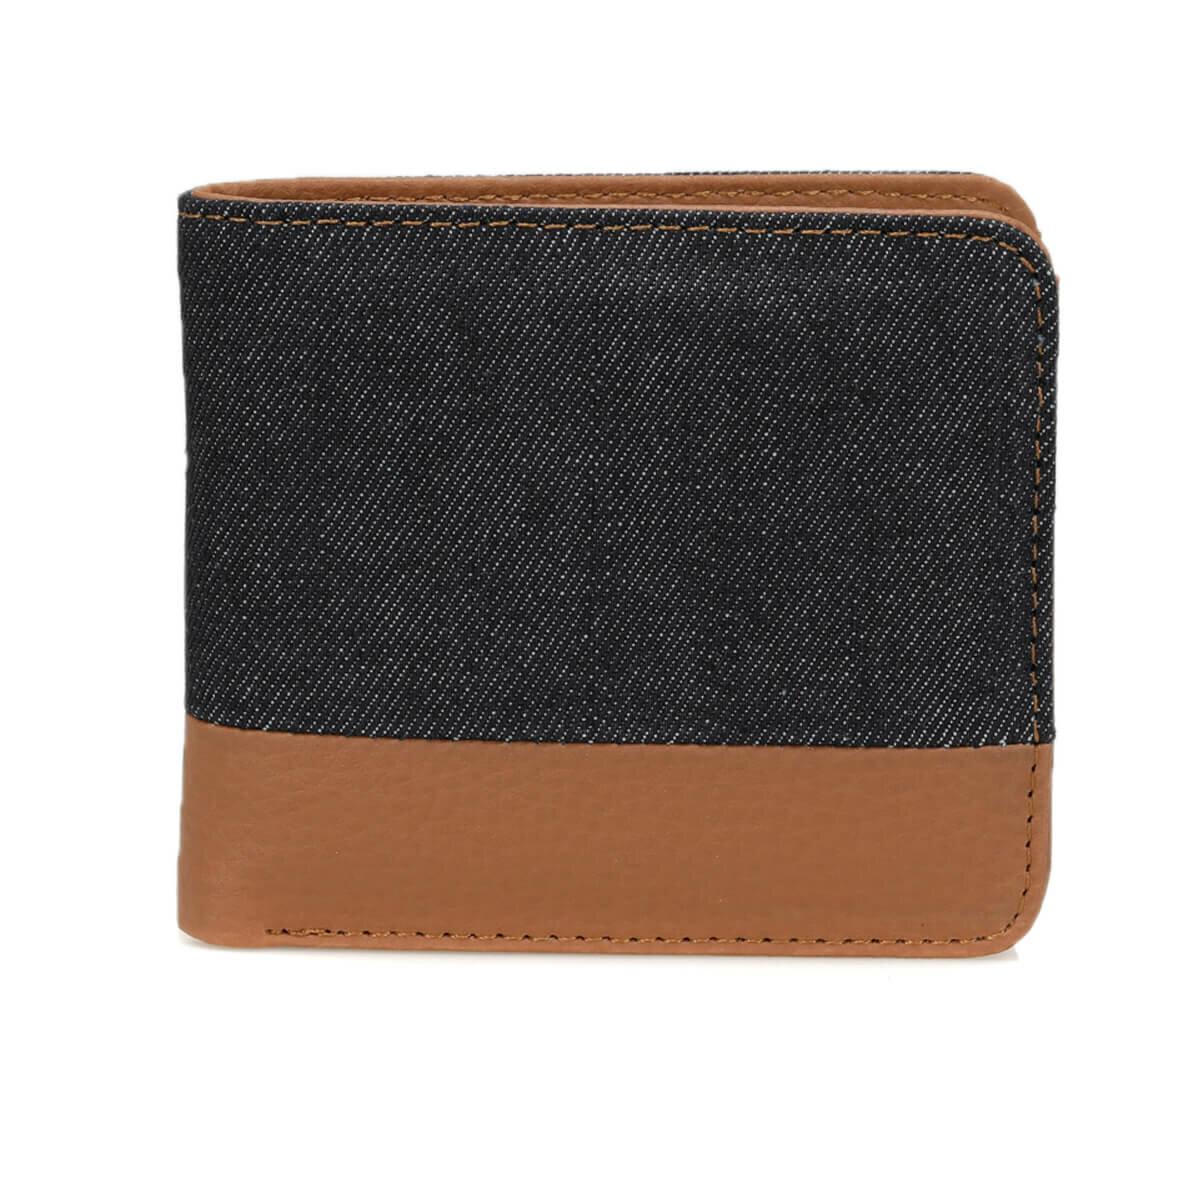 FLO MGVN2221 Multicolour Male Wallet Oxide